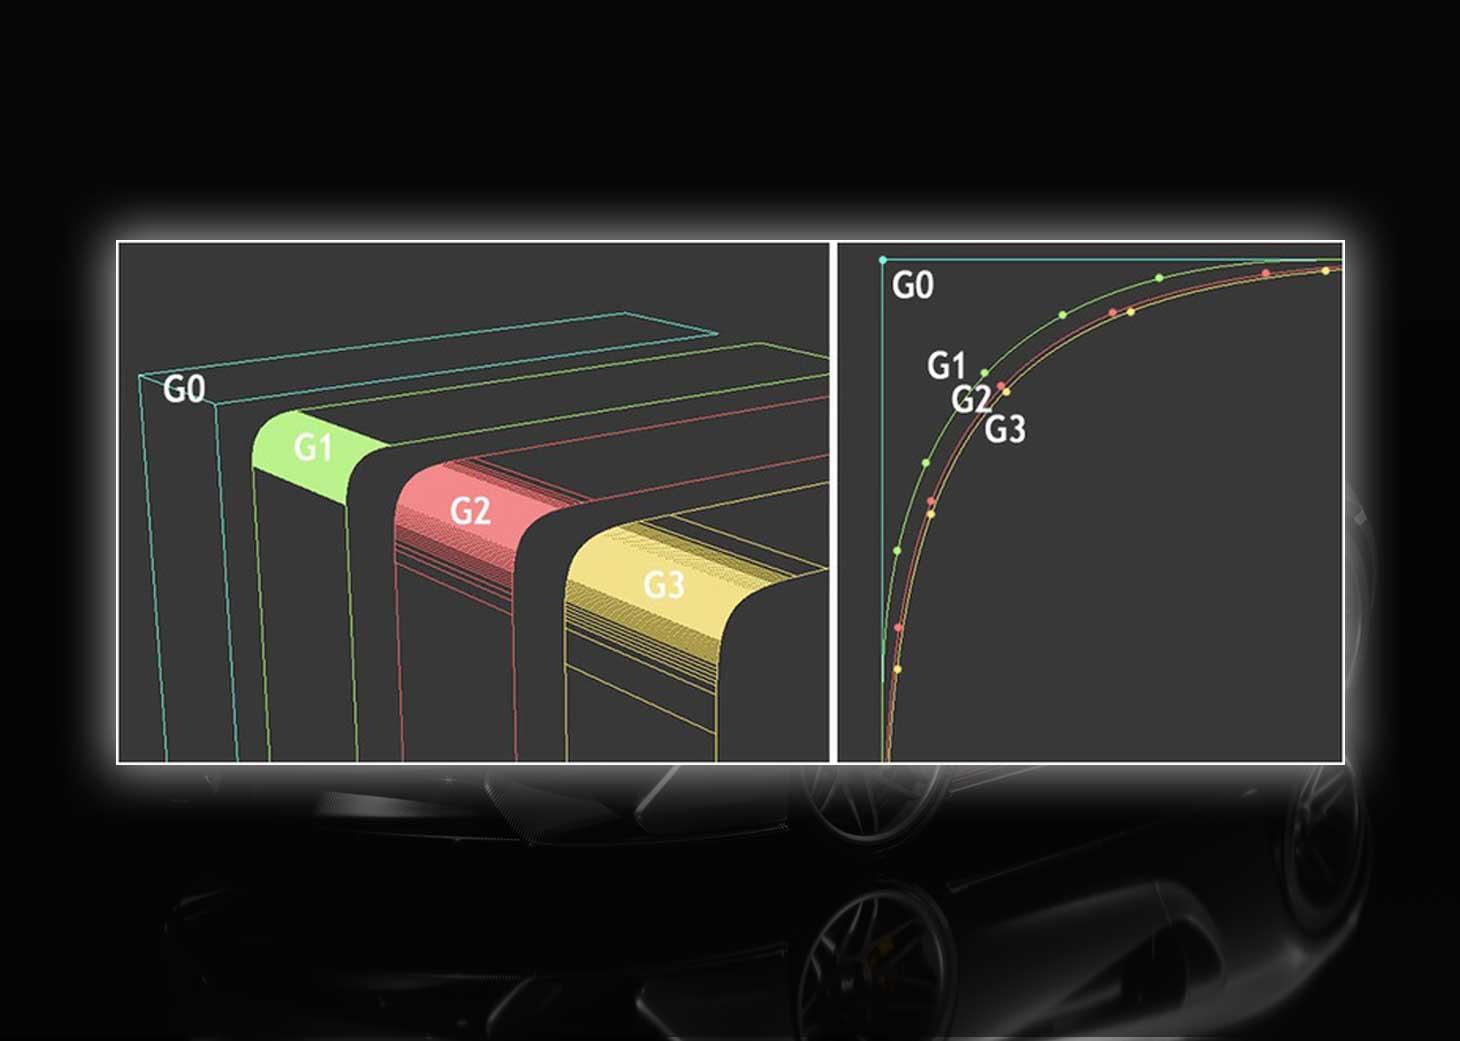 modeling using polygons car 3ds max maya6g - مدلسازی خودرو در تری دی مکس